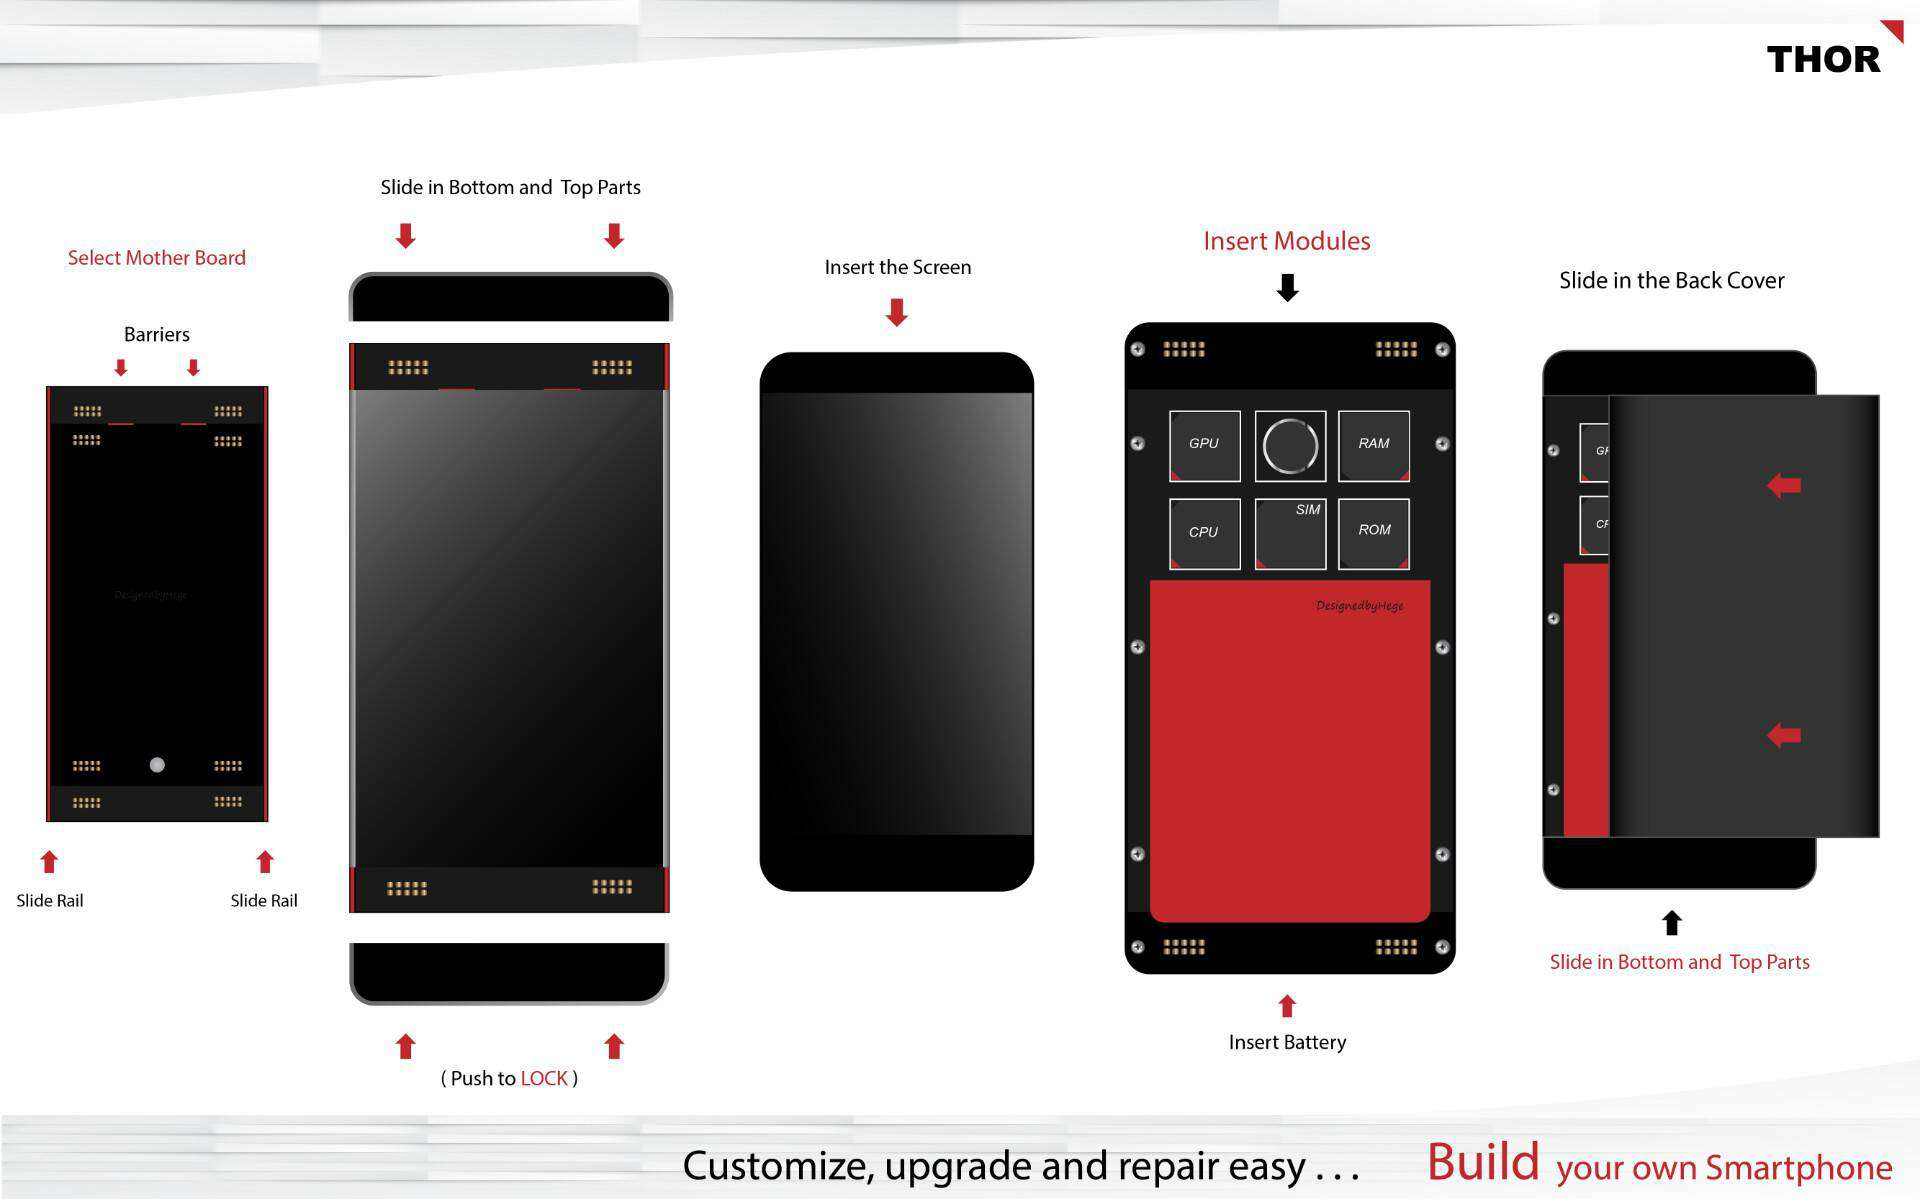 THOR modular smartphone concept 1